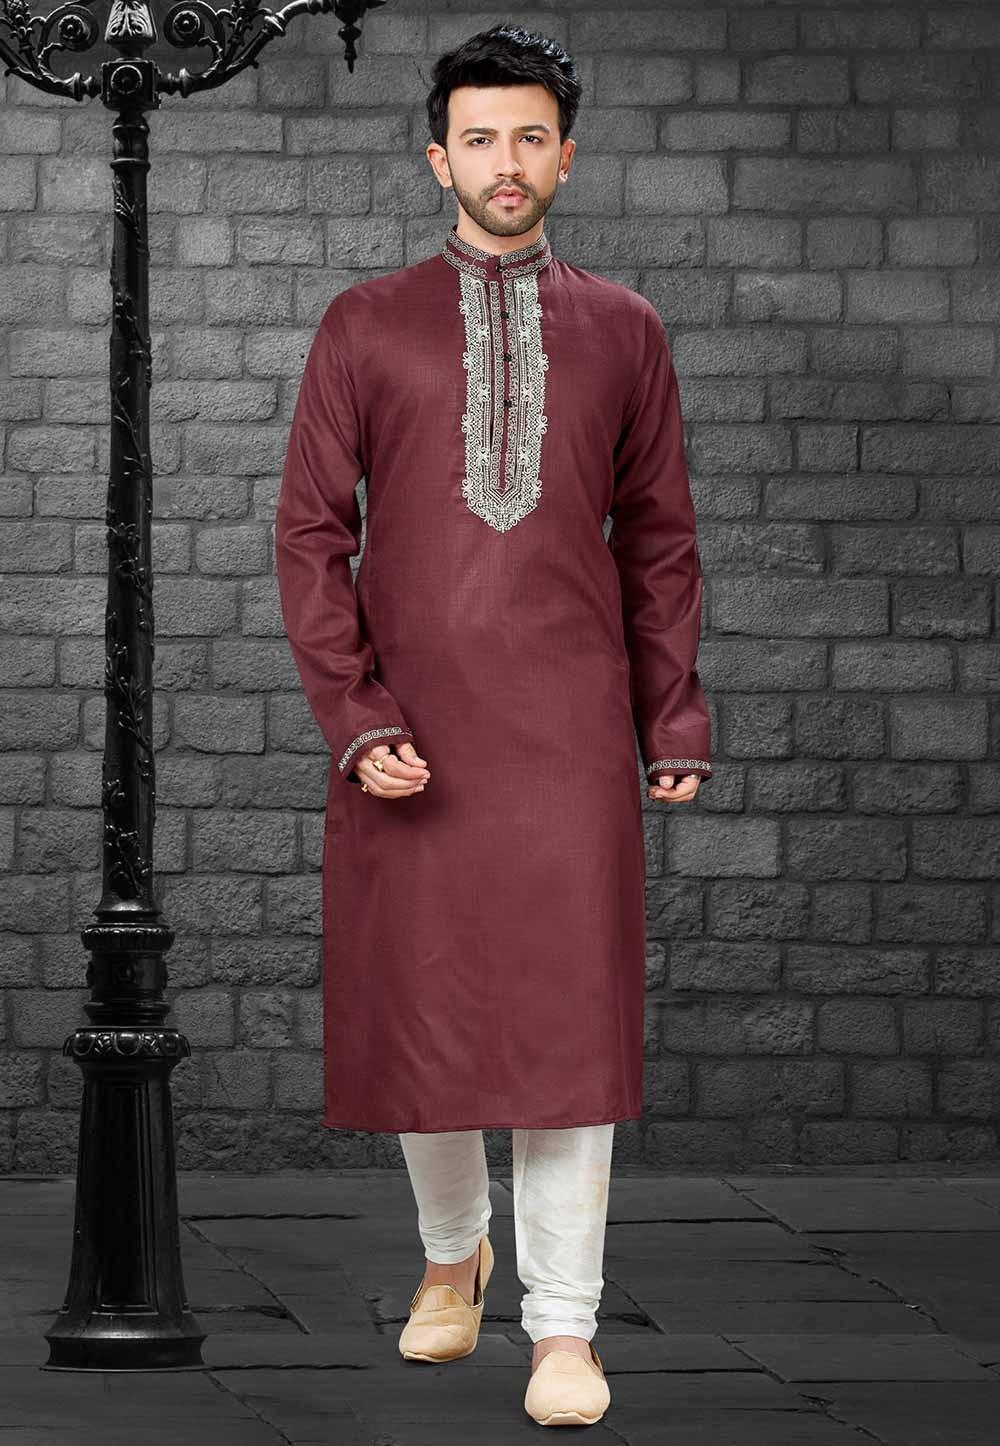 Designer: Buy Kurta Pyjama Online in Maroon Colour